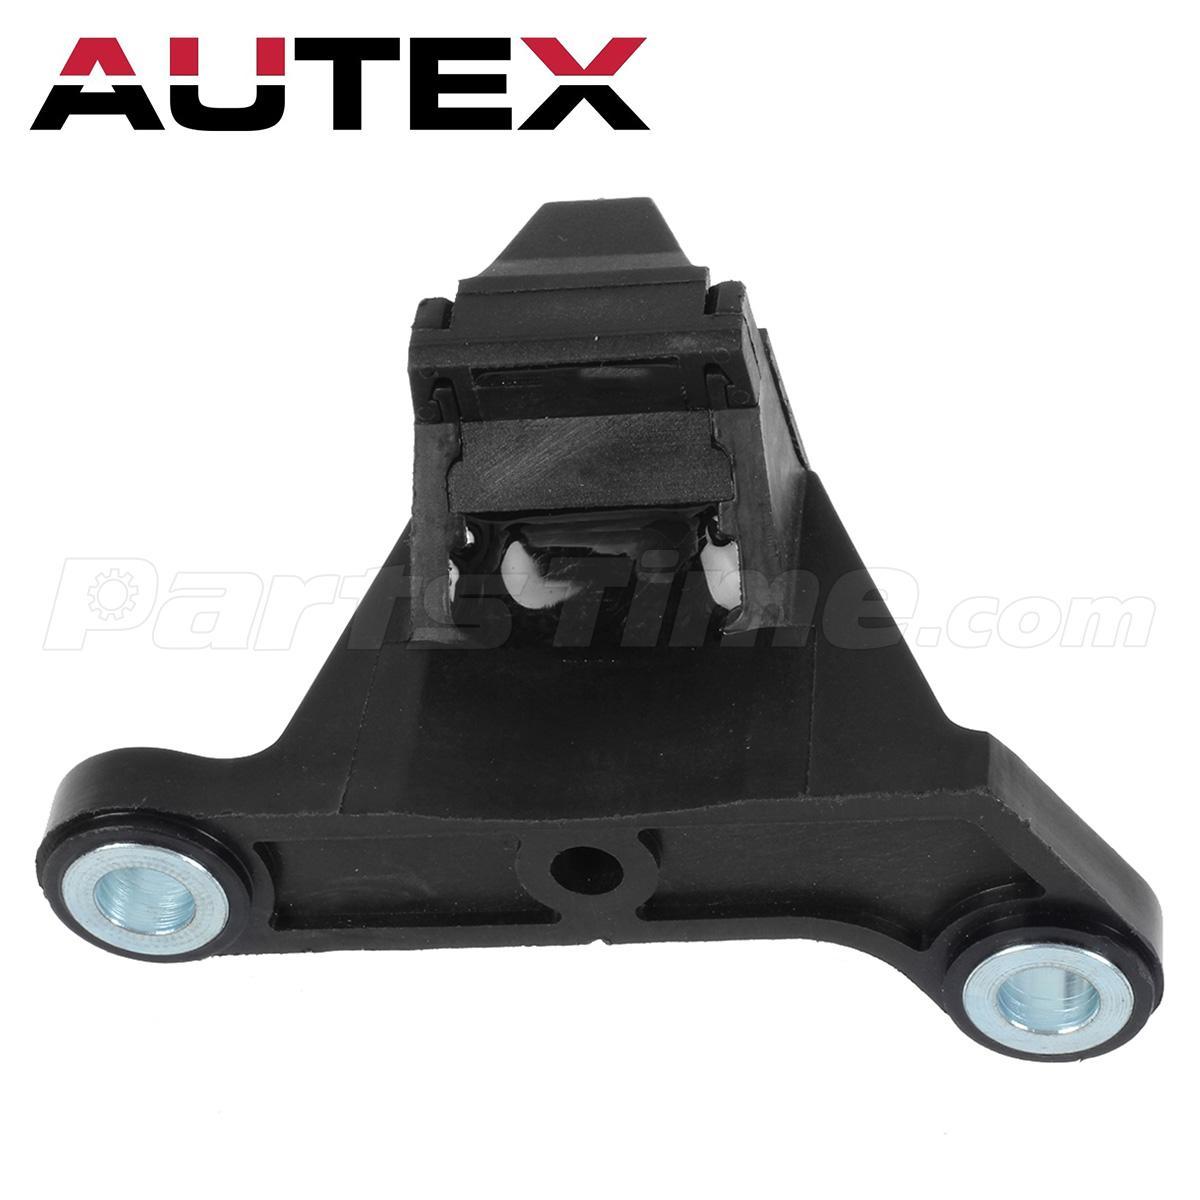 Crank Position Sensor Chevy 5 3: Crankshaft Crank Cam Shaft Position Sensor 5S1678 For 1995